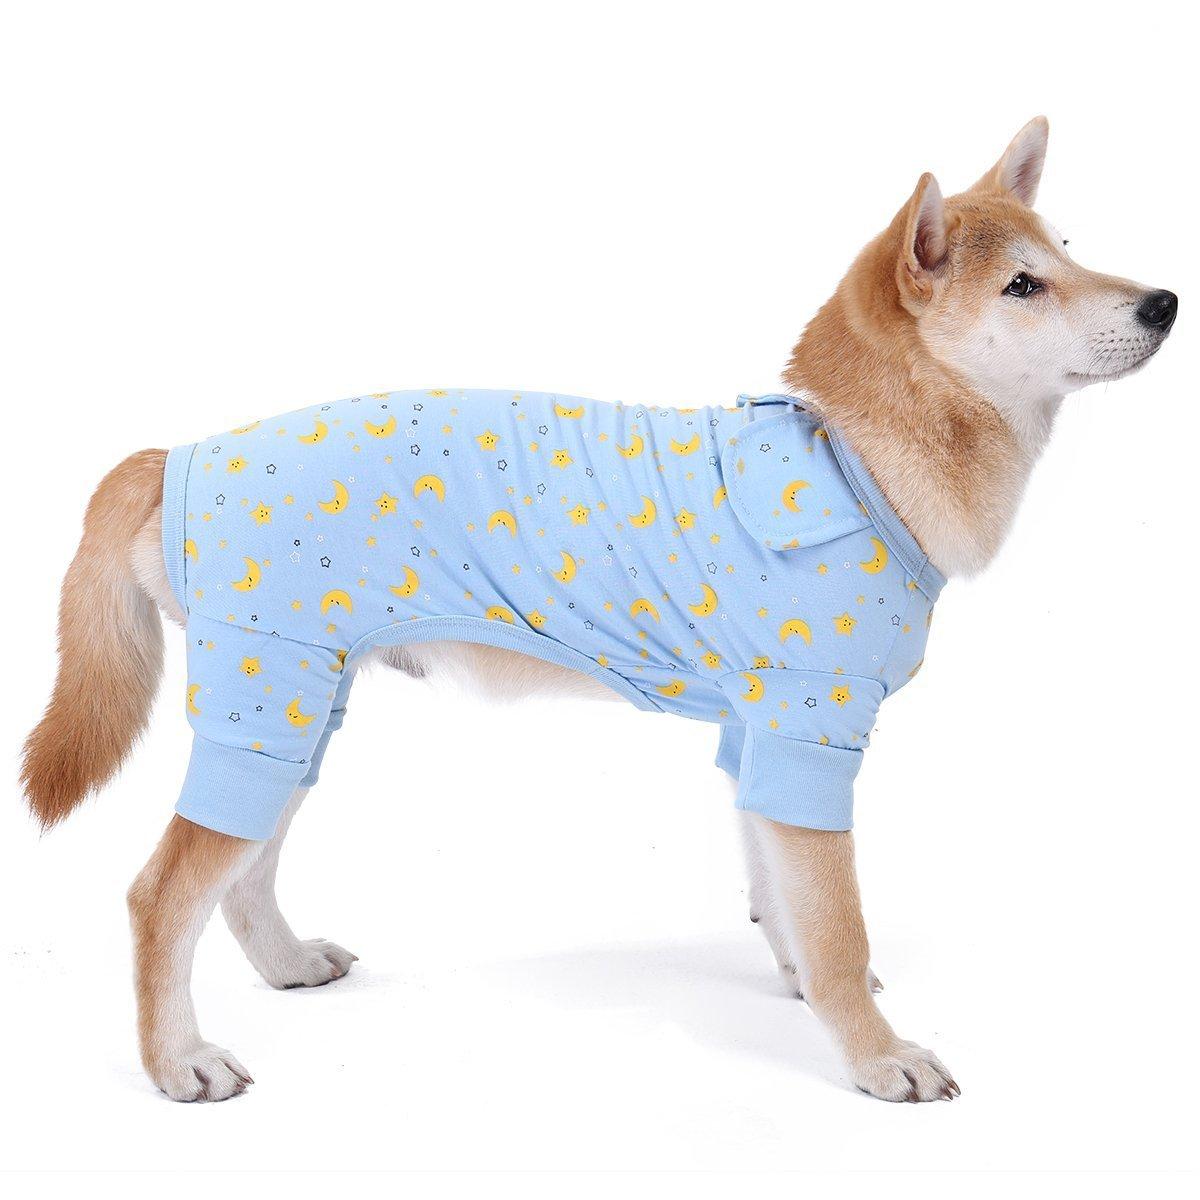 bluee L(Back 13.8\ bluee L(Back 13.8\ Speedy Pet Dog Cat Jumpsuit Pajamas, Adorable Shirt Sleepwear Dog Clothes Soft Pet Pajamas Puppy Apparel (L(Back 13.8 ,Neck 8.7 ,Chest 13.4 ), bluee)